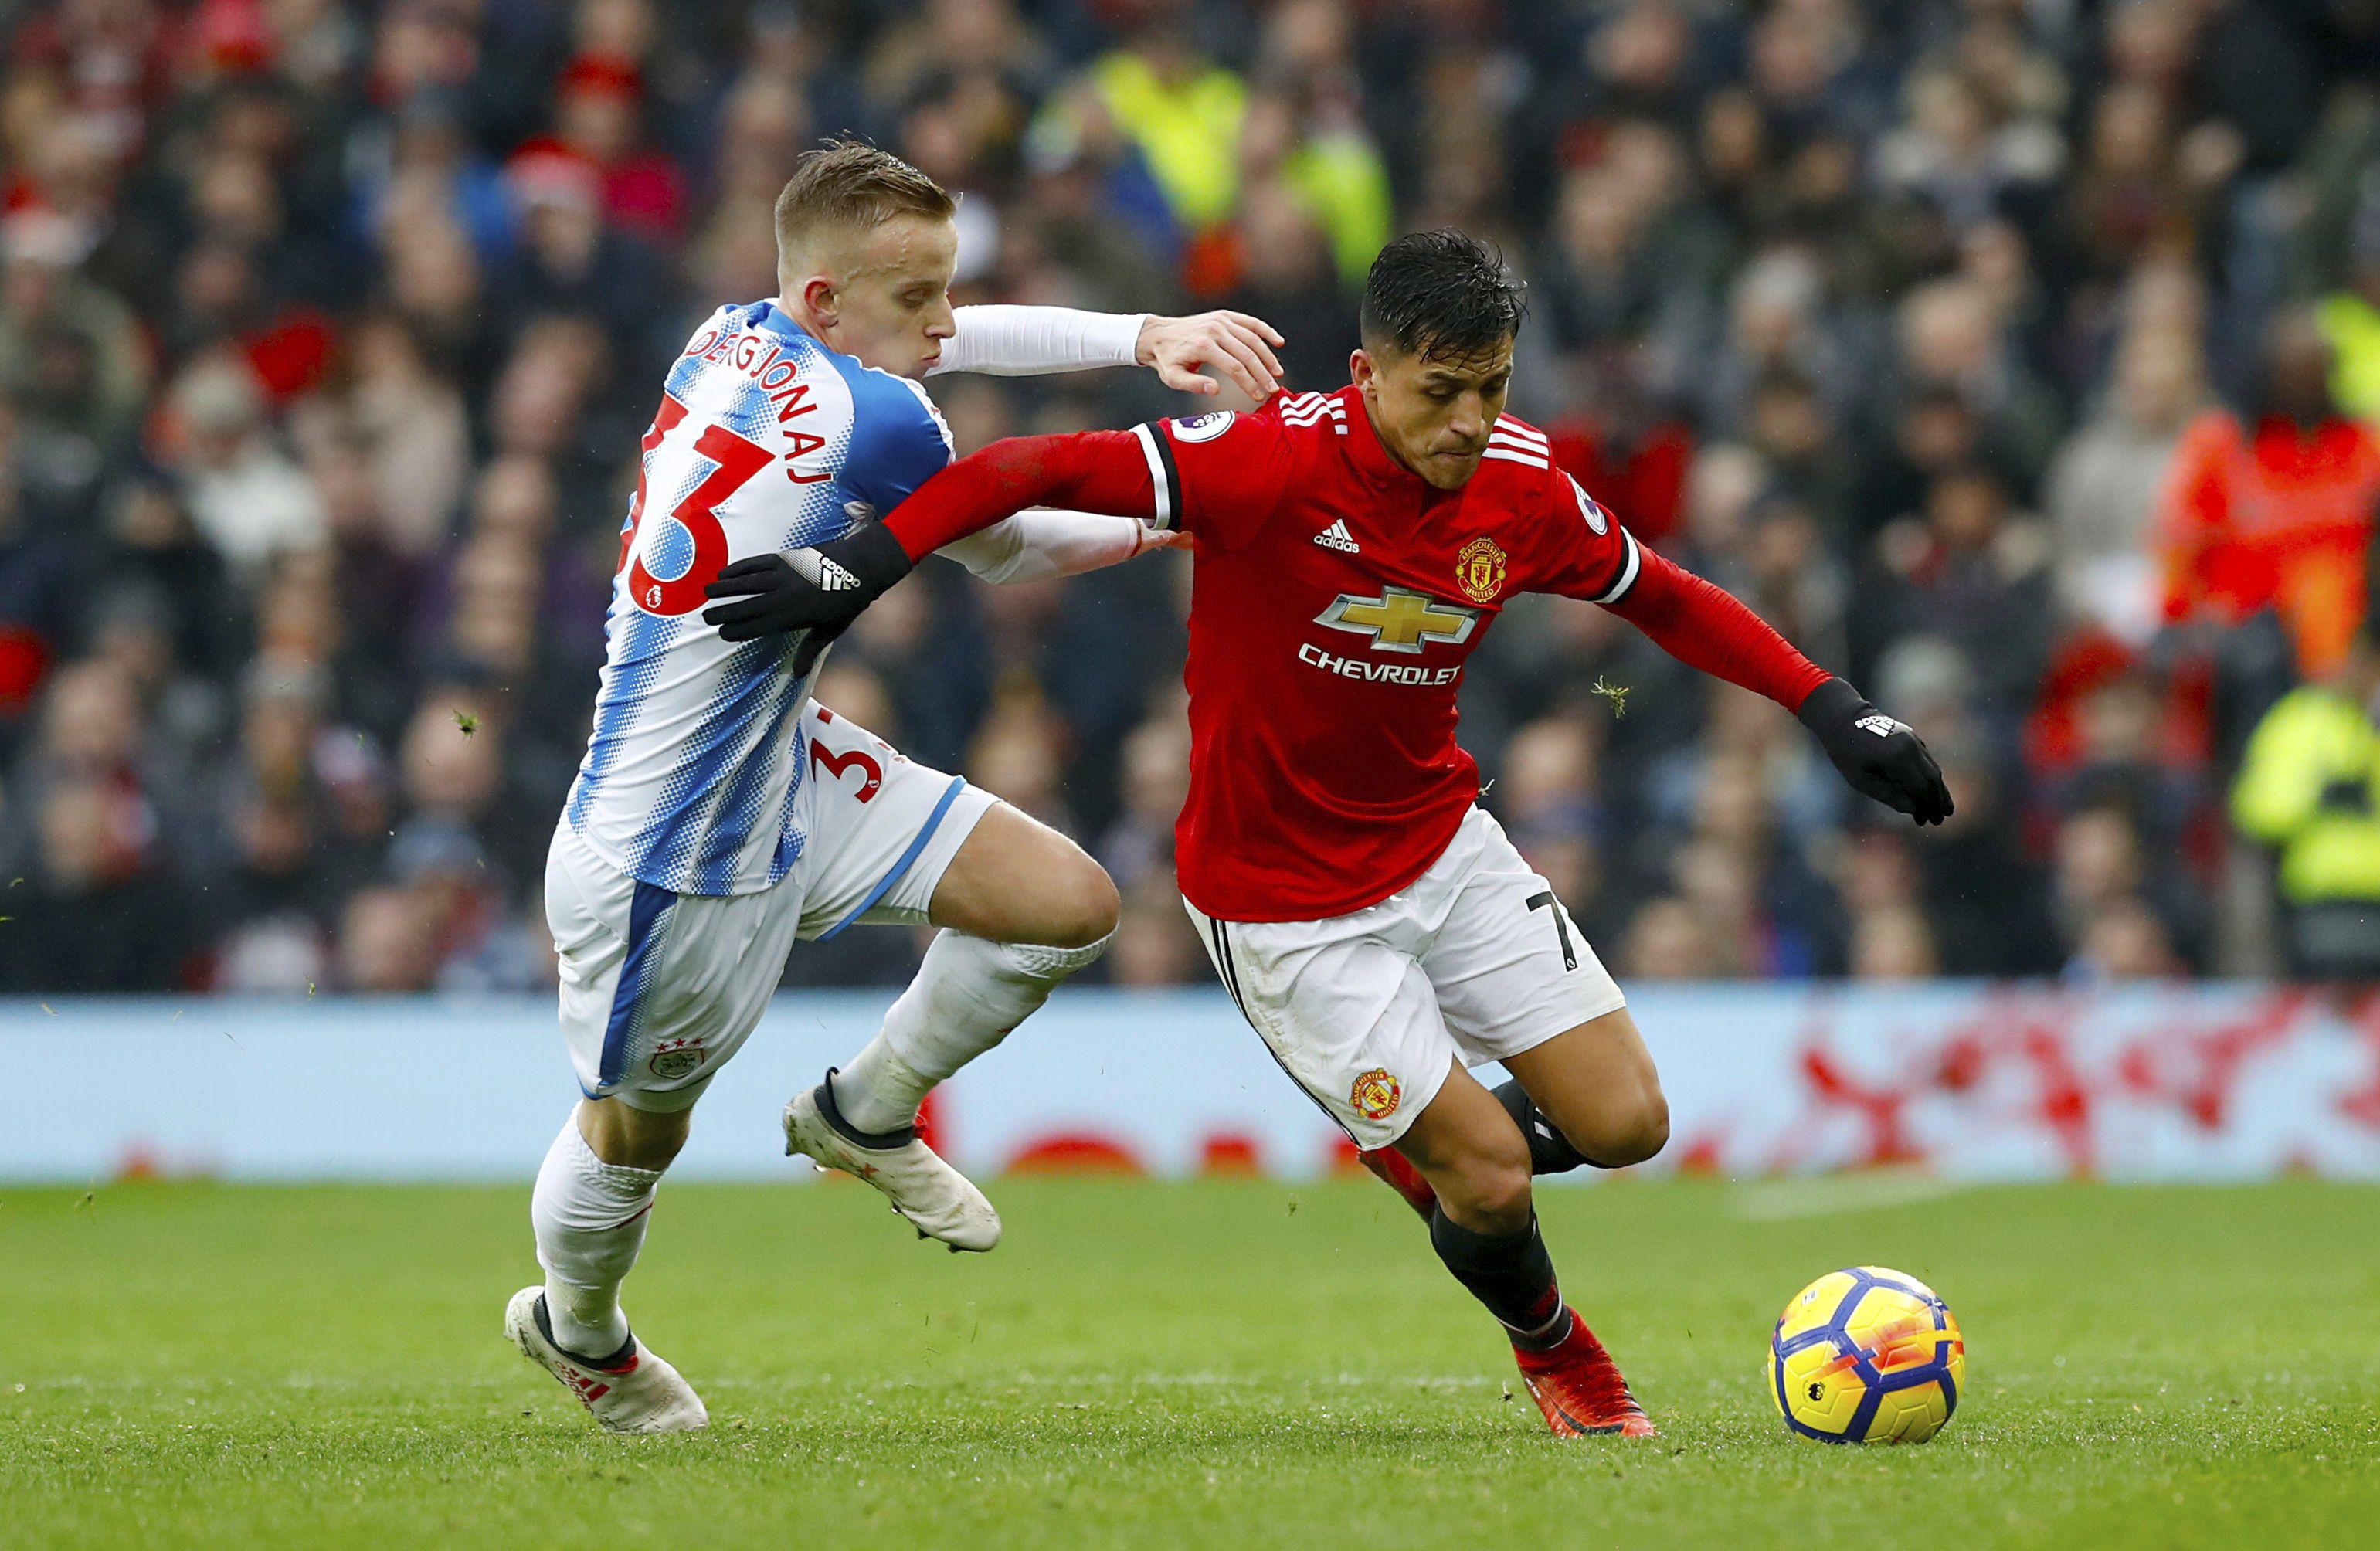 Mkhitaryan, Sanchez prosper at new homes after transfer